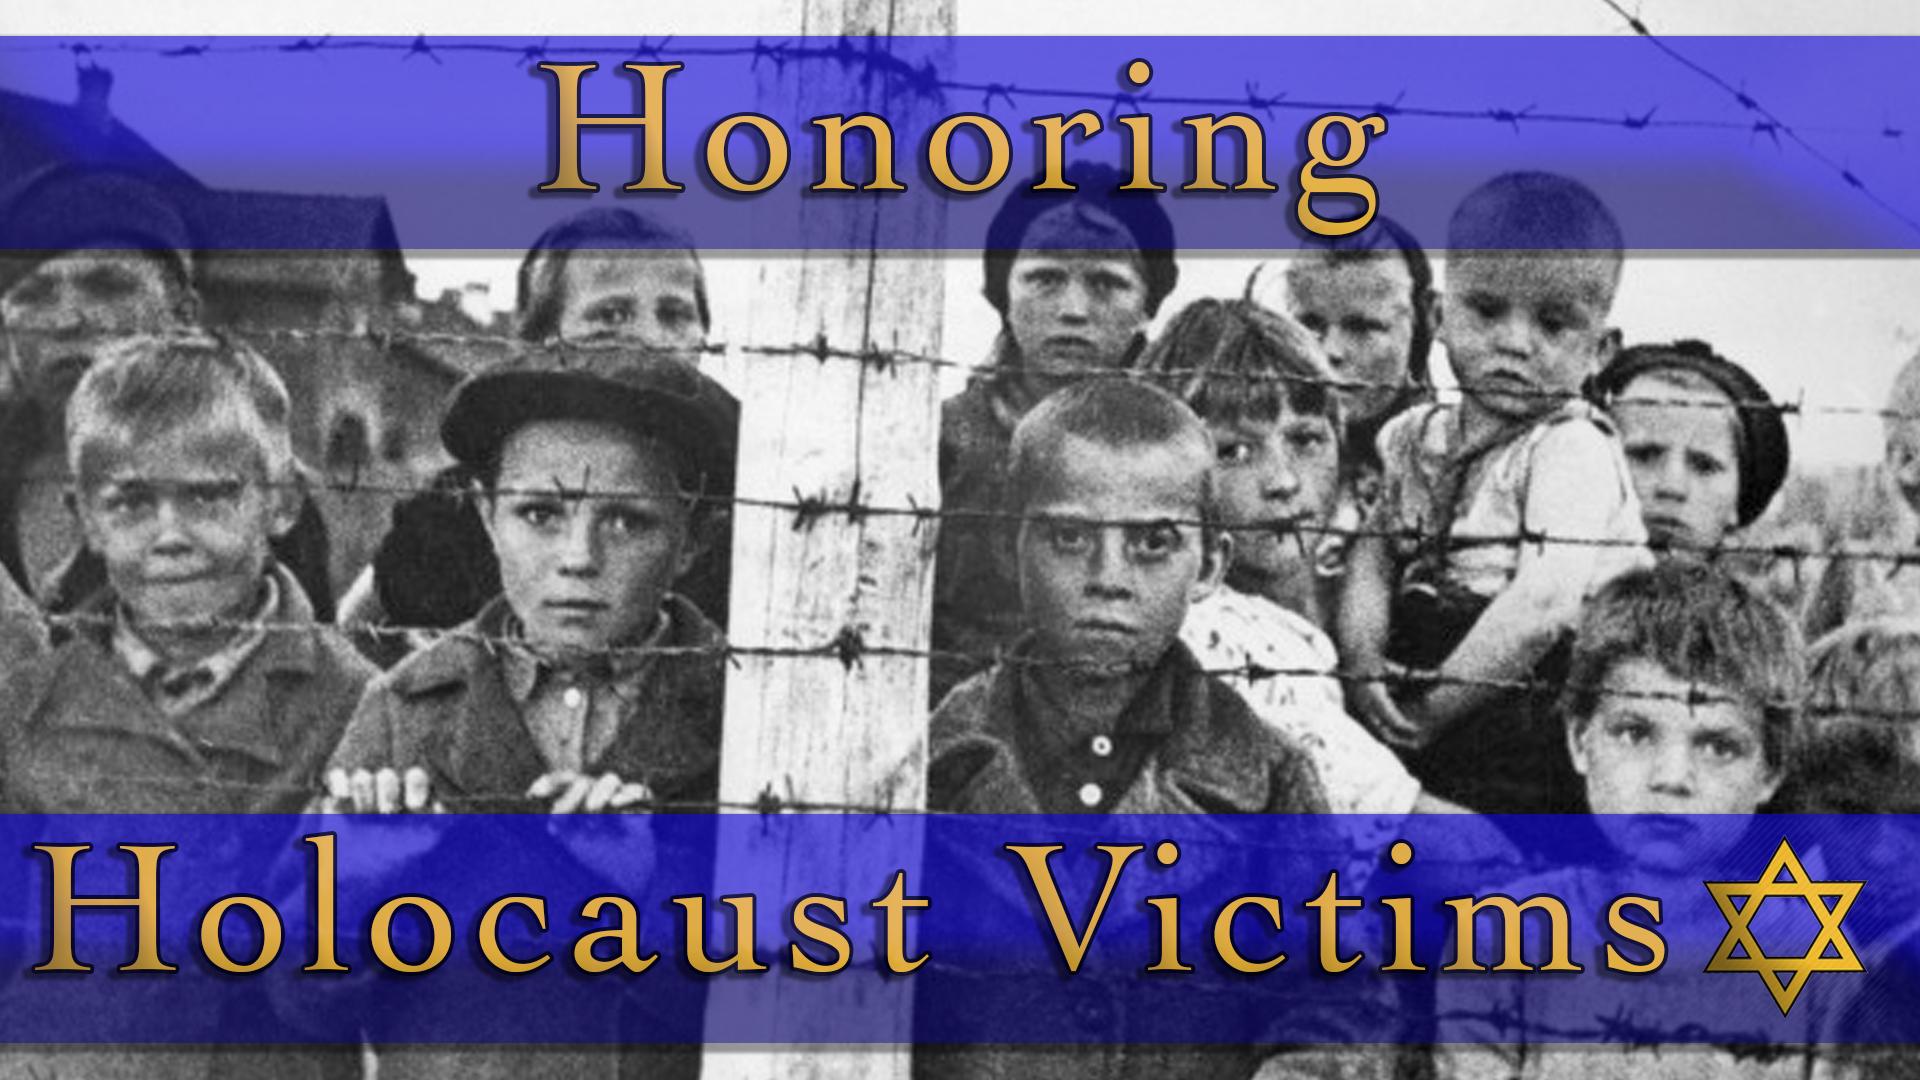 Honoring Holocaust Victims